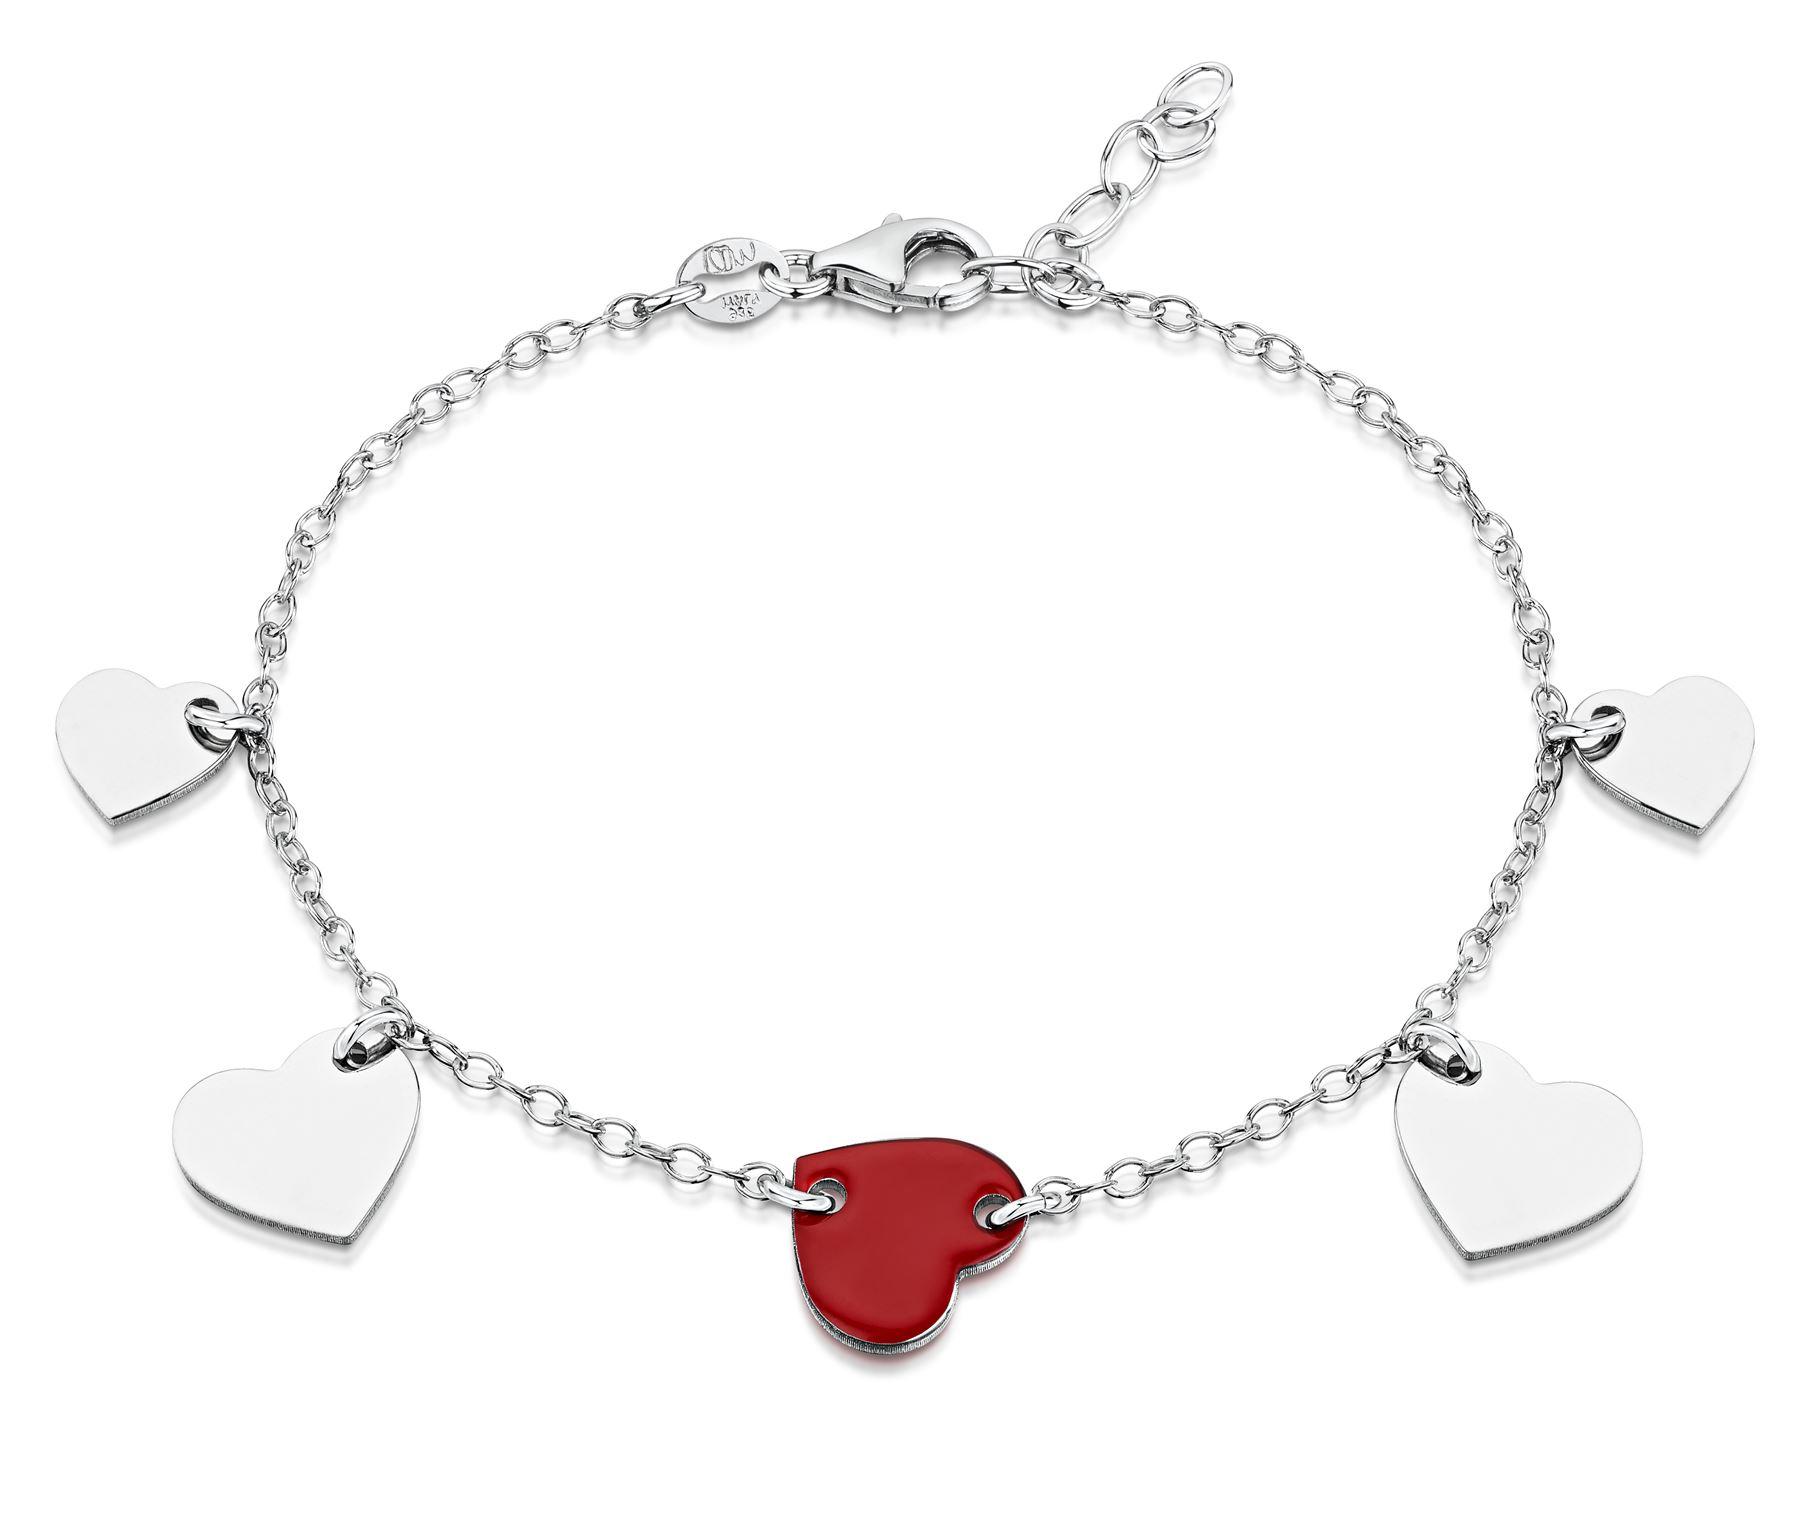 Amberta-Jewelry-925-Sterling-Silver-Adjustable-Bracelet-Italian-Bangle-for-Women thumbnail 53